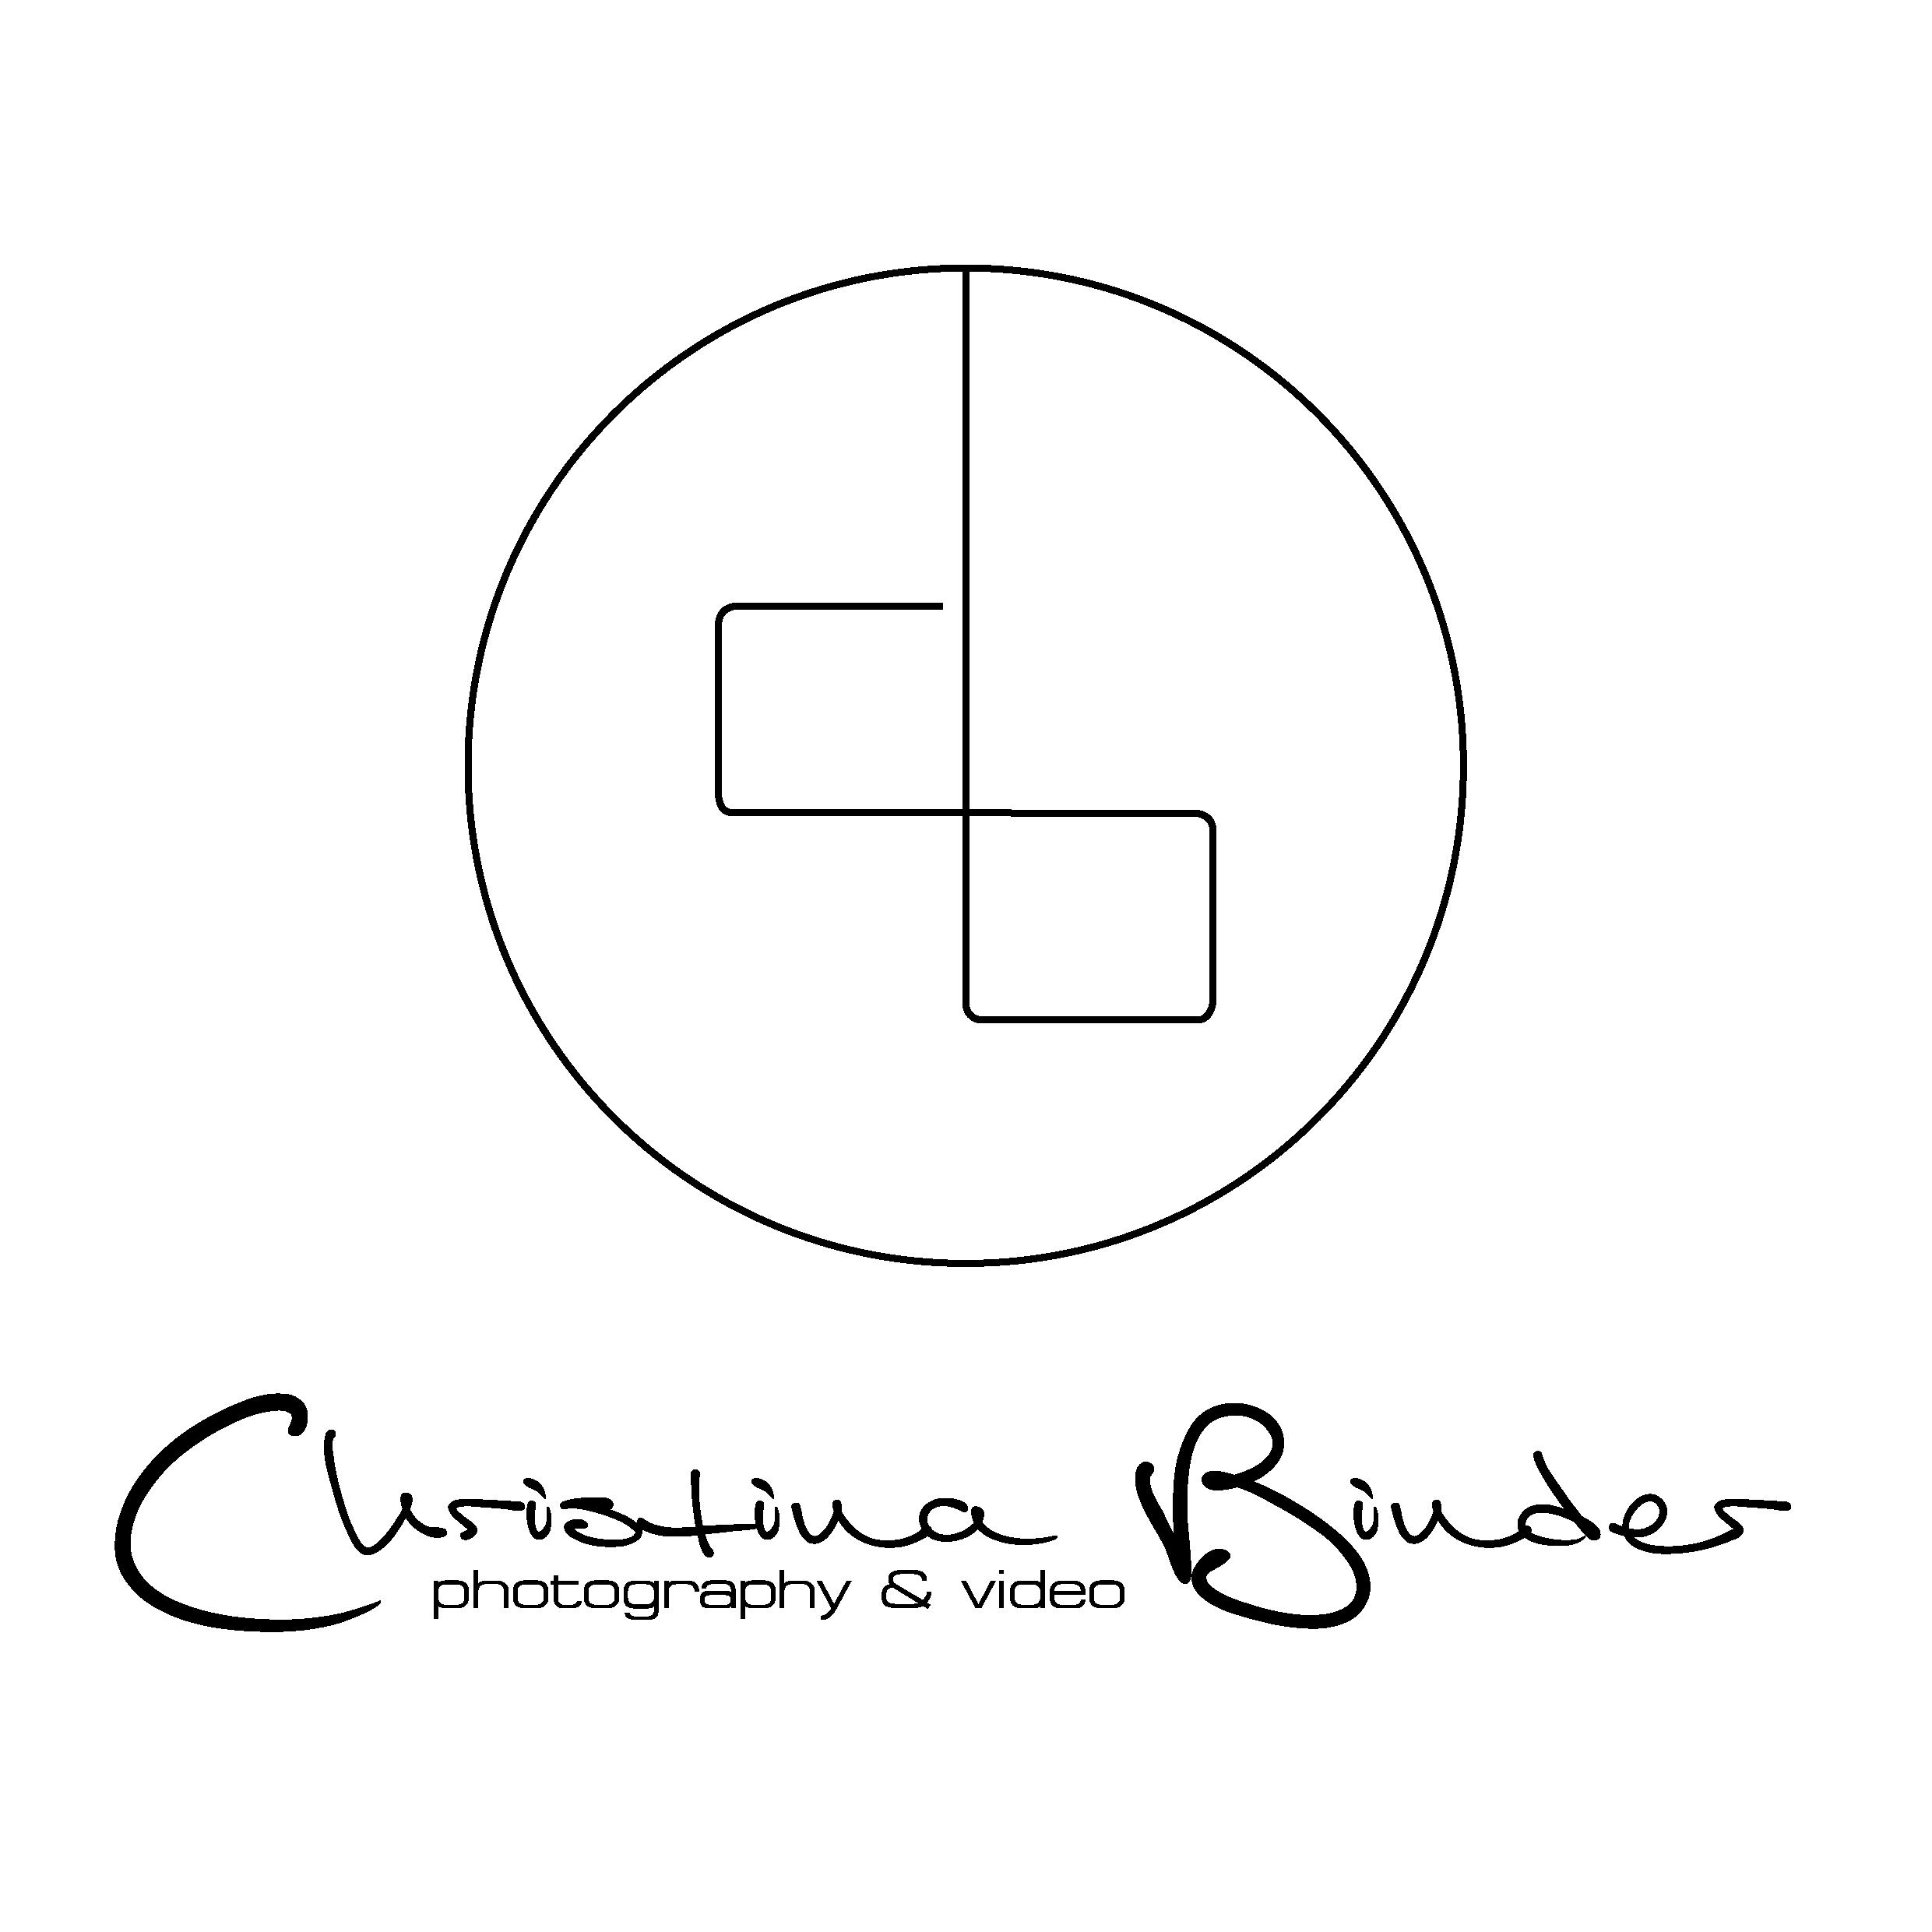 Logo_mittig_Name_abstract_schwarzaufweiß-01